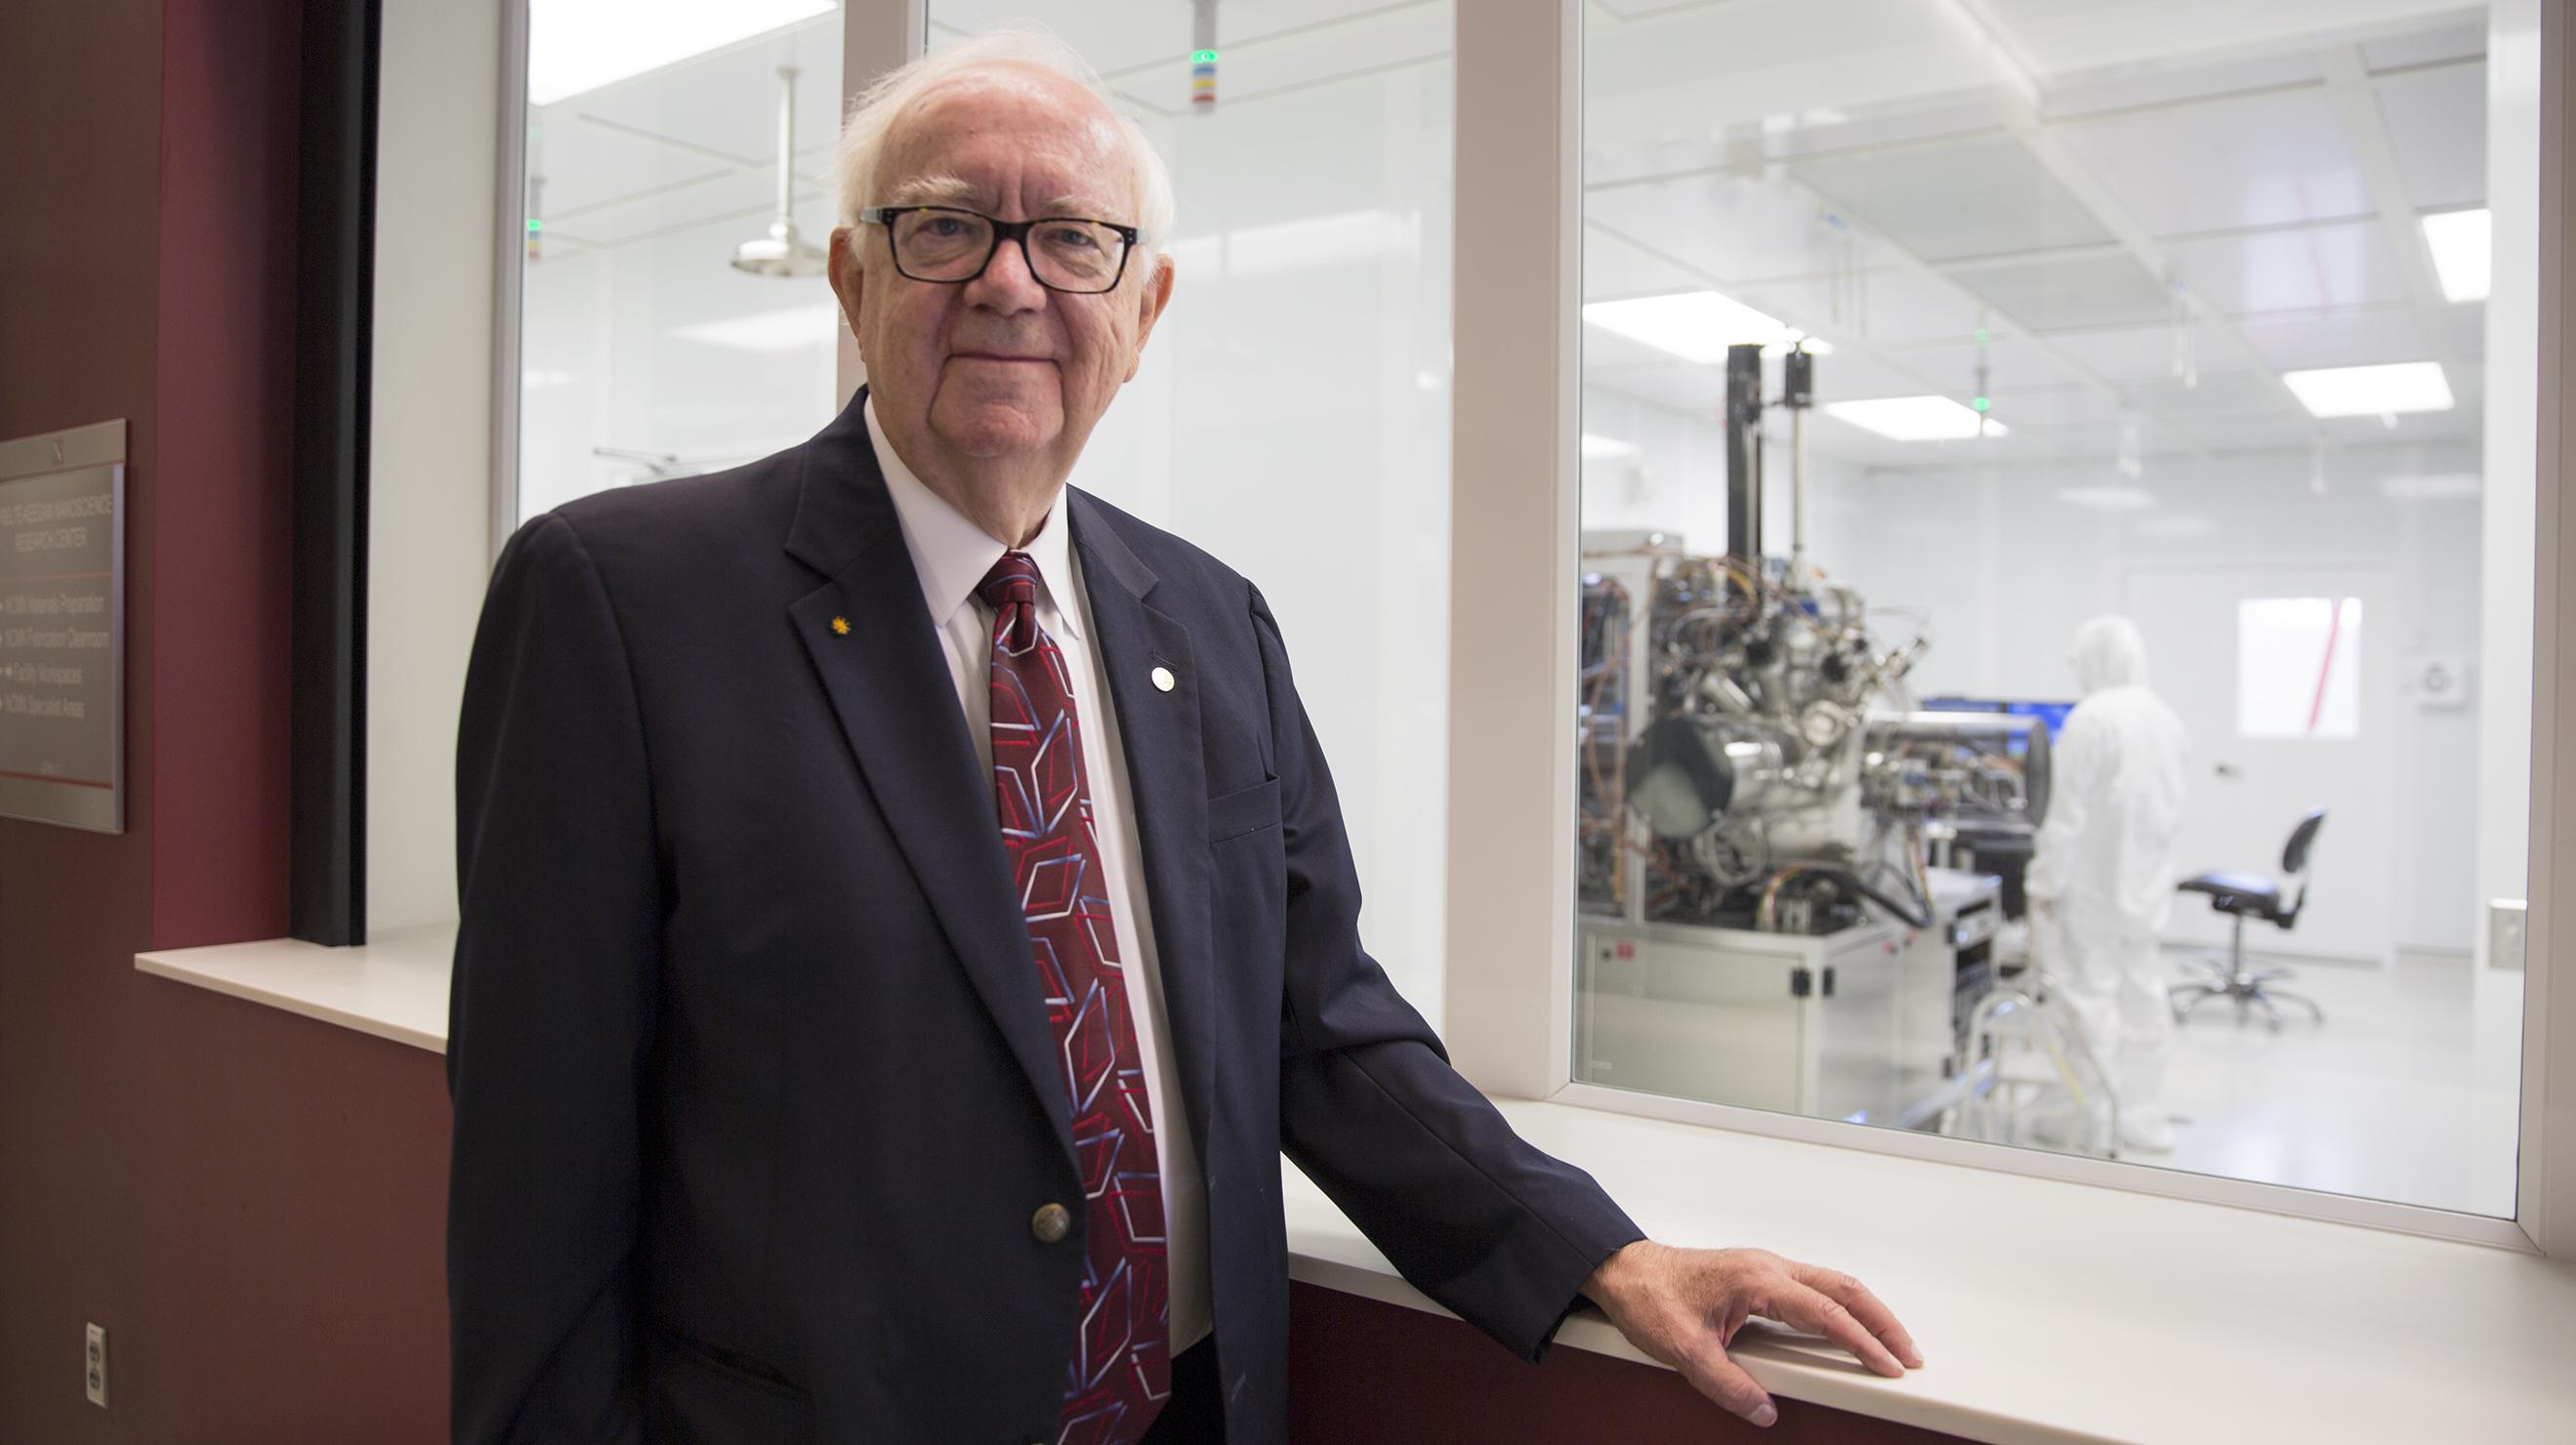 unl wins 3 5 million nsf grant for regional nanoscience center david sellmyer troy fedderson university communications